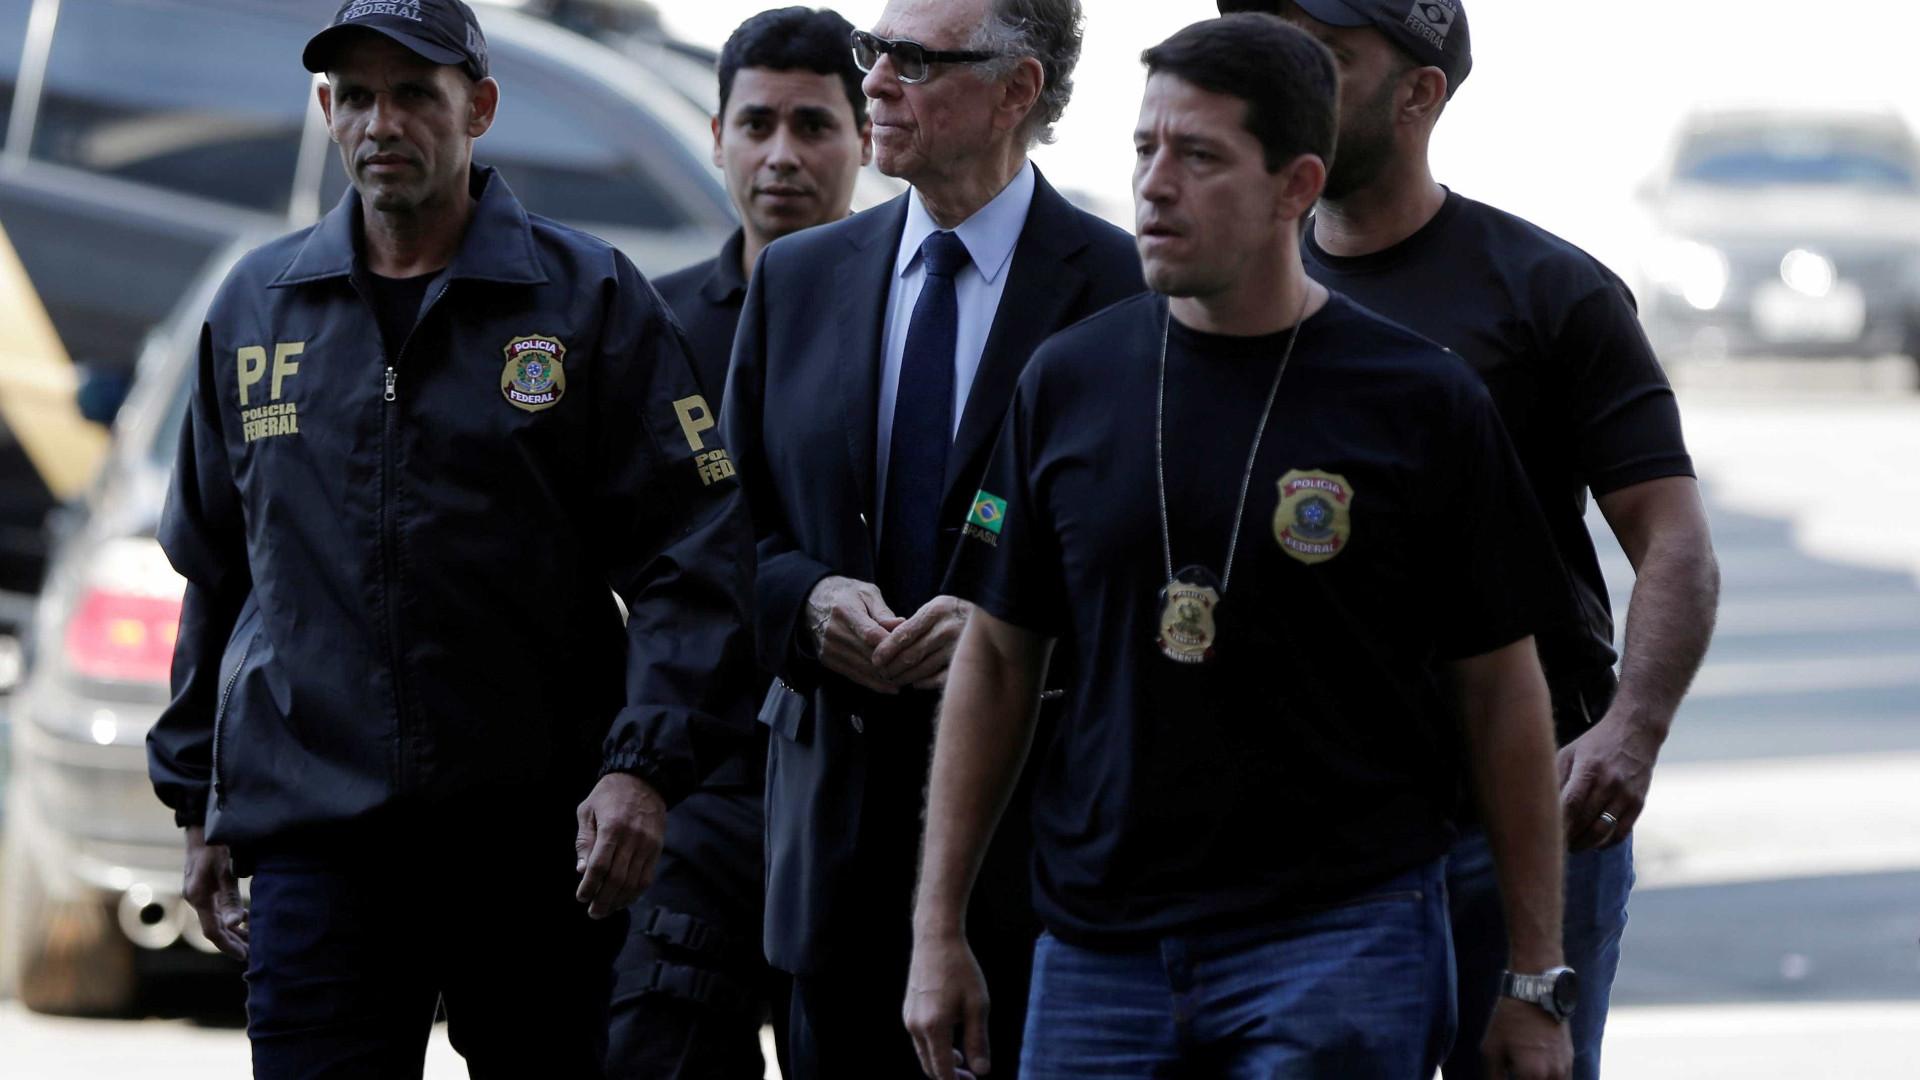 Nuzman deixa presídio no Rio de Janeiro